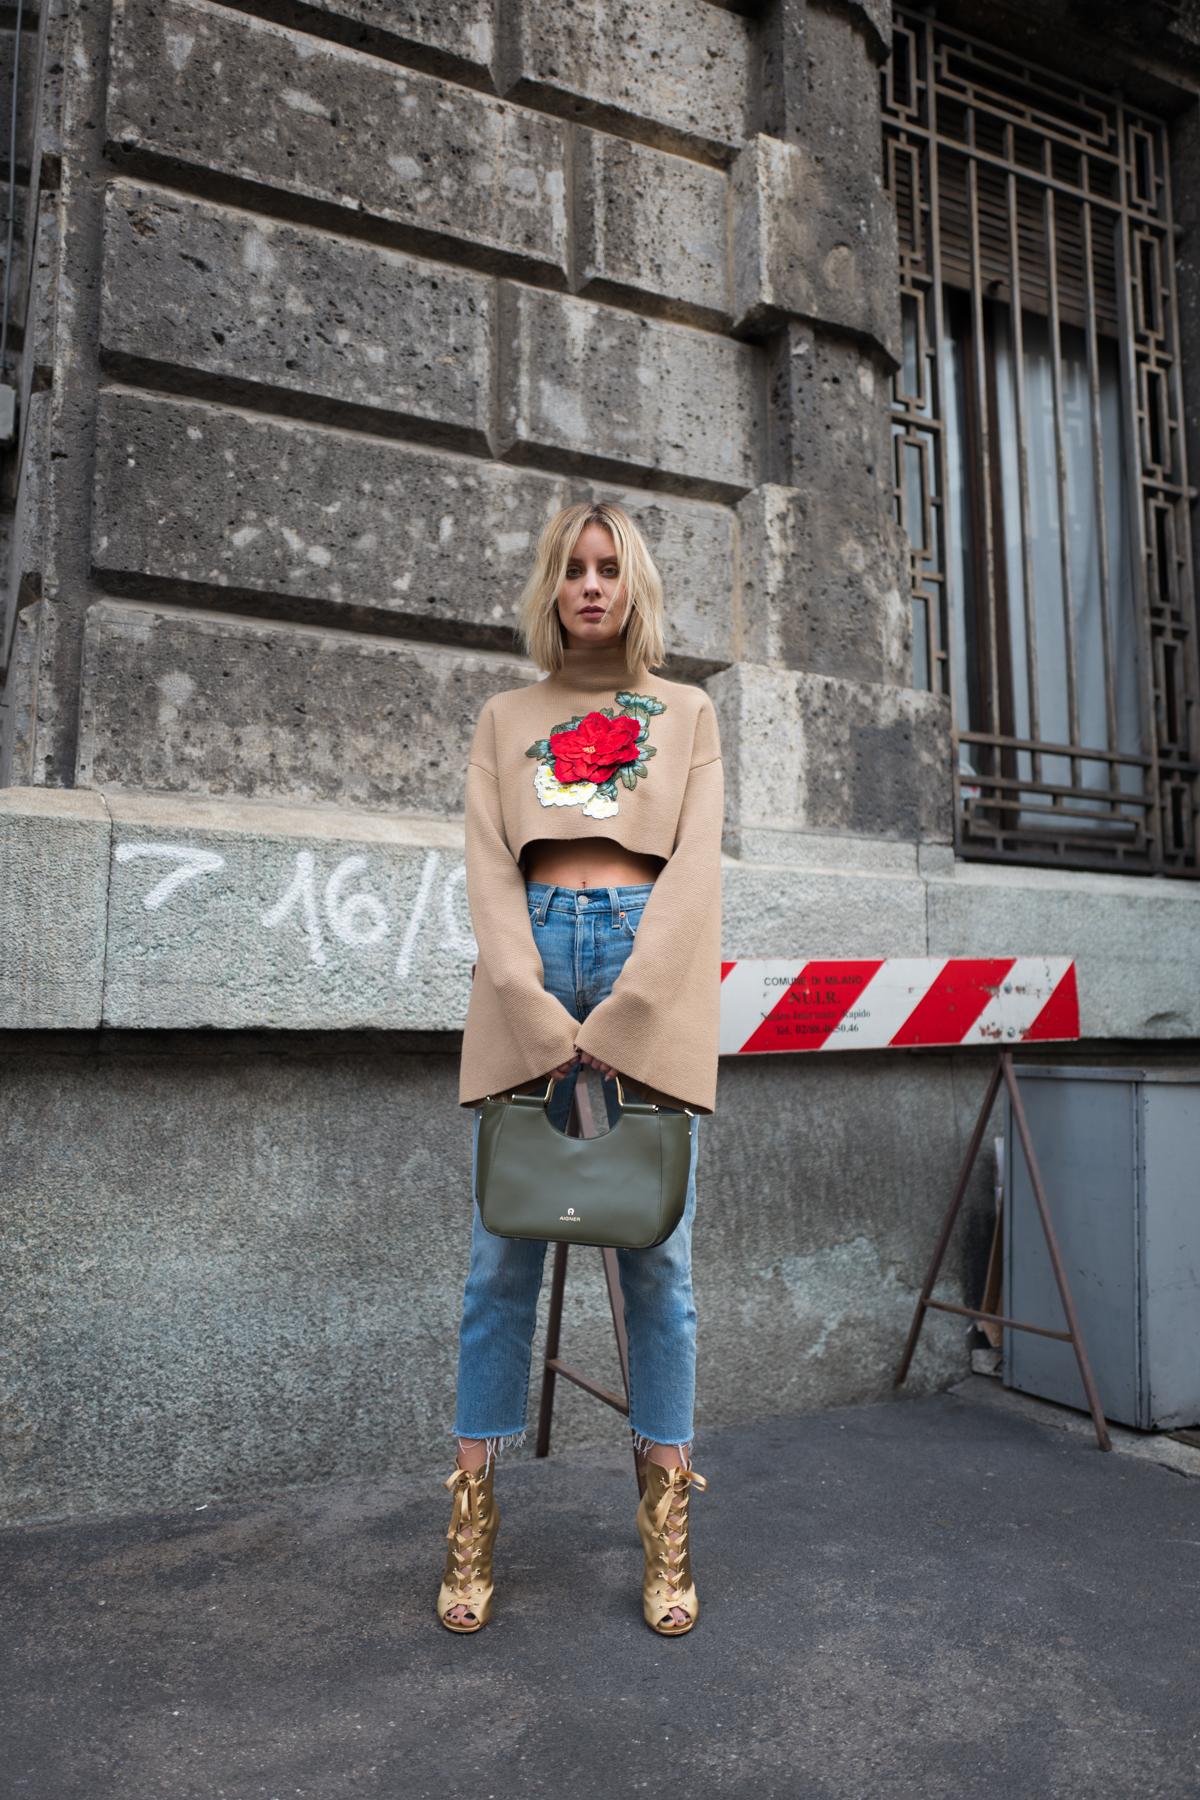 #AignerLove Milan Fashion Week Outfit Lisa Hahnbück Fashion Blogger